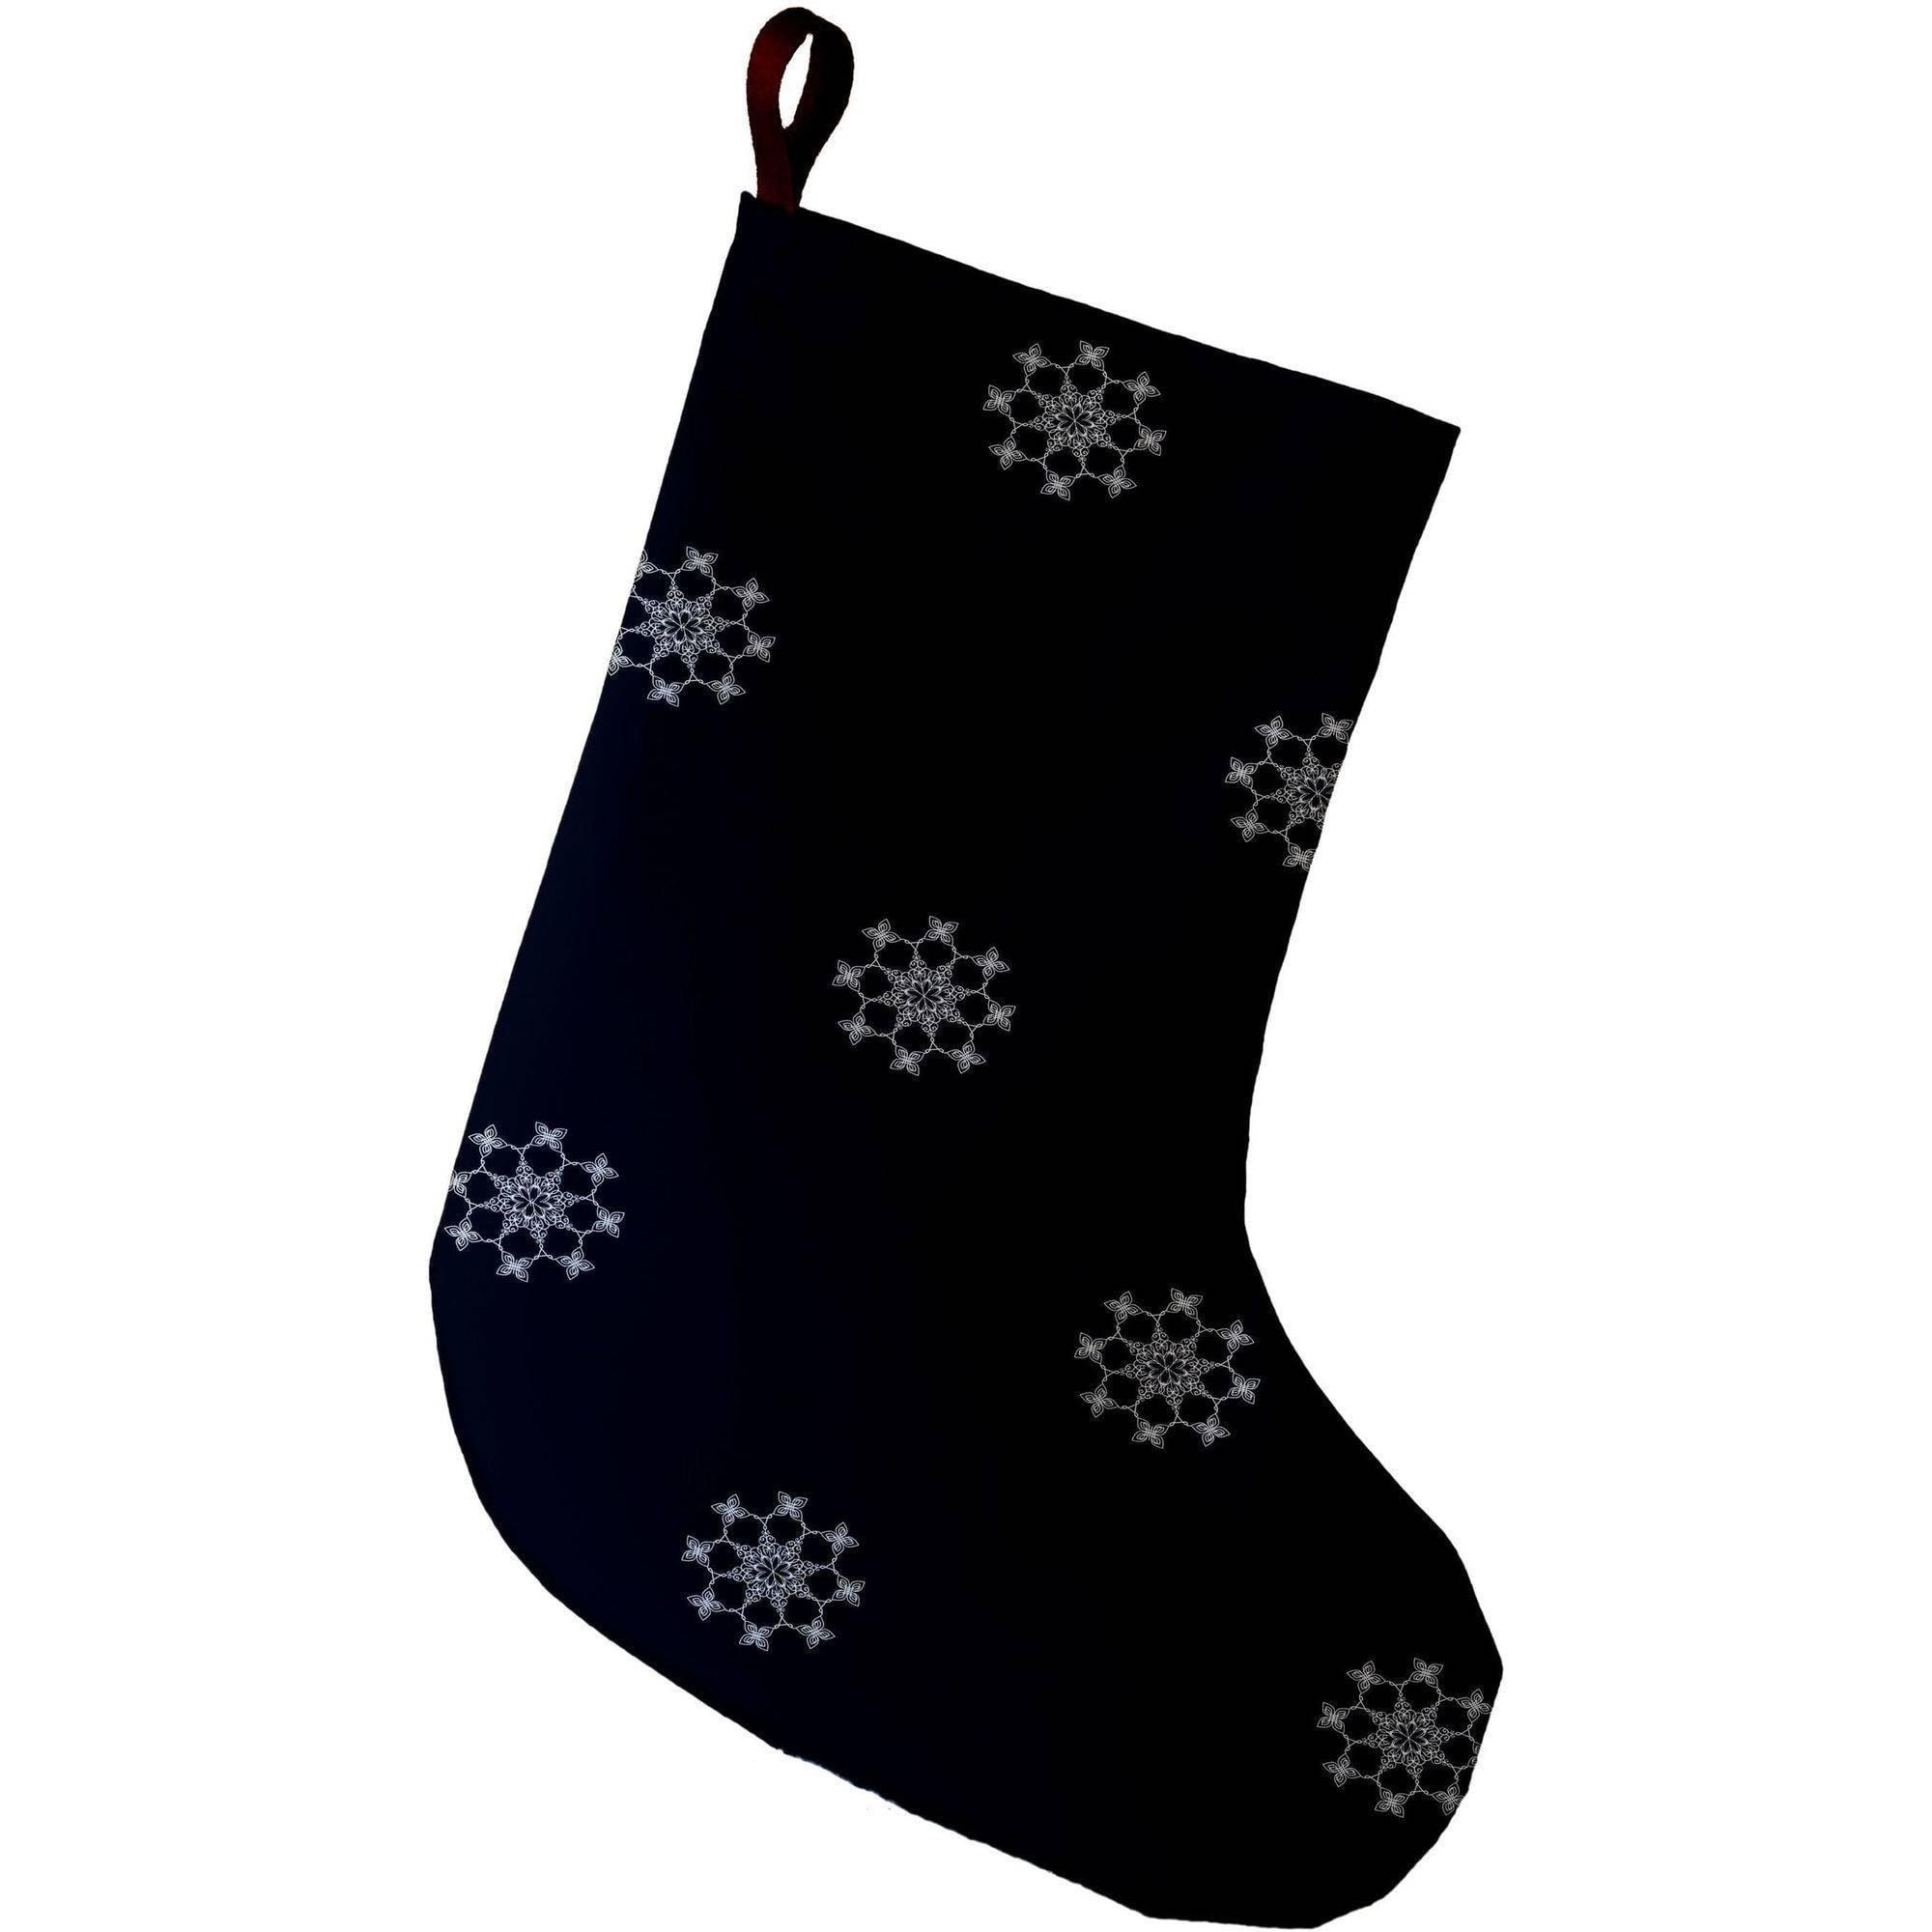 E By Design Simply Daisy, 9 x 16, Falling Snow, Decorative Holiday Geometric Print Stocking